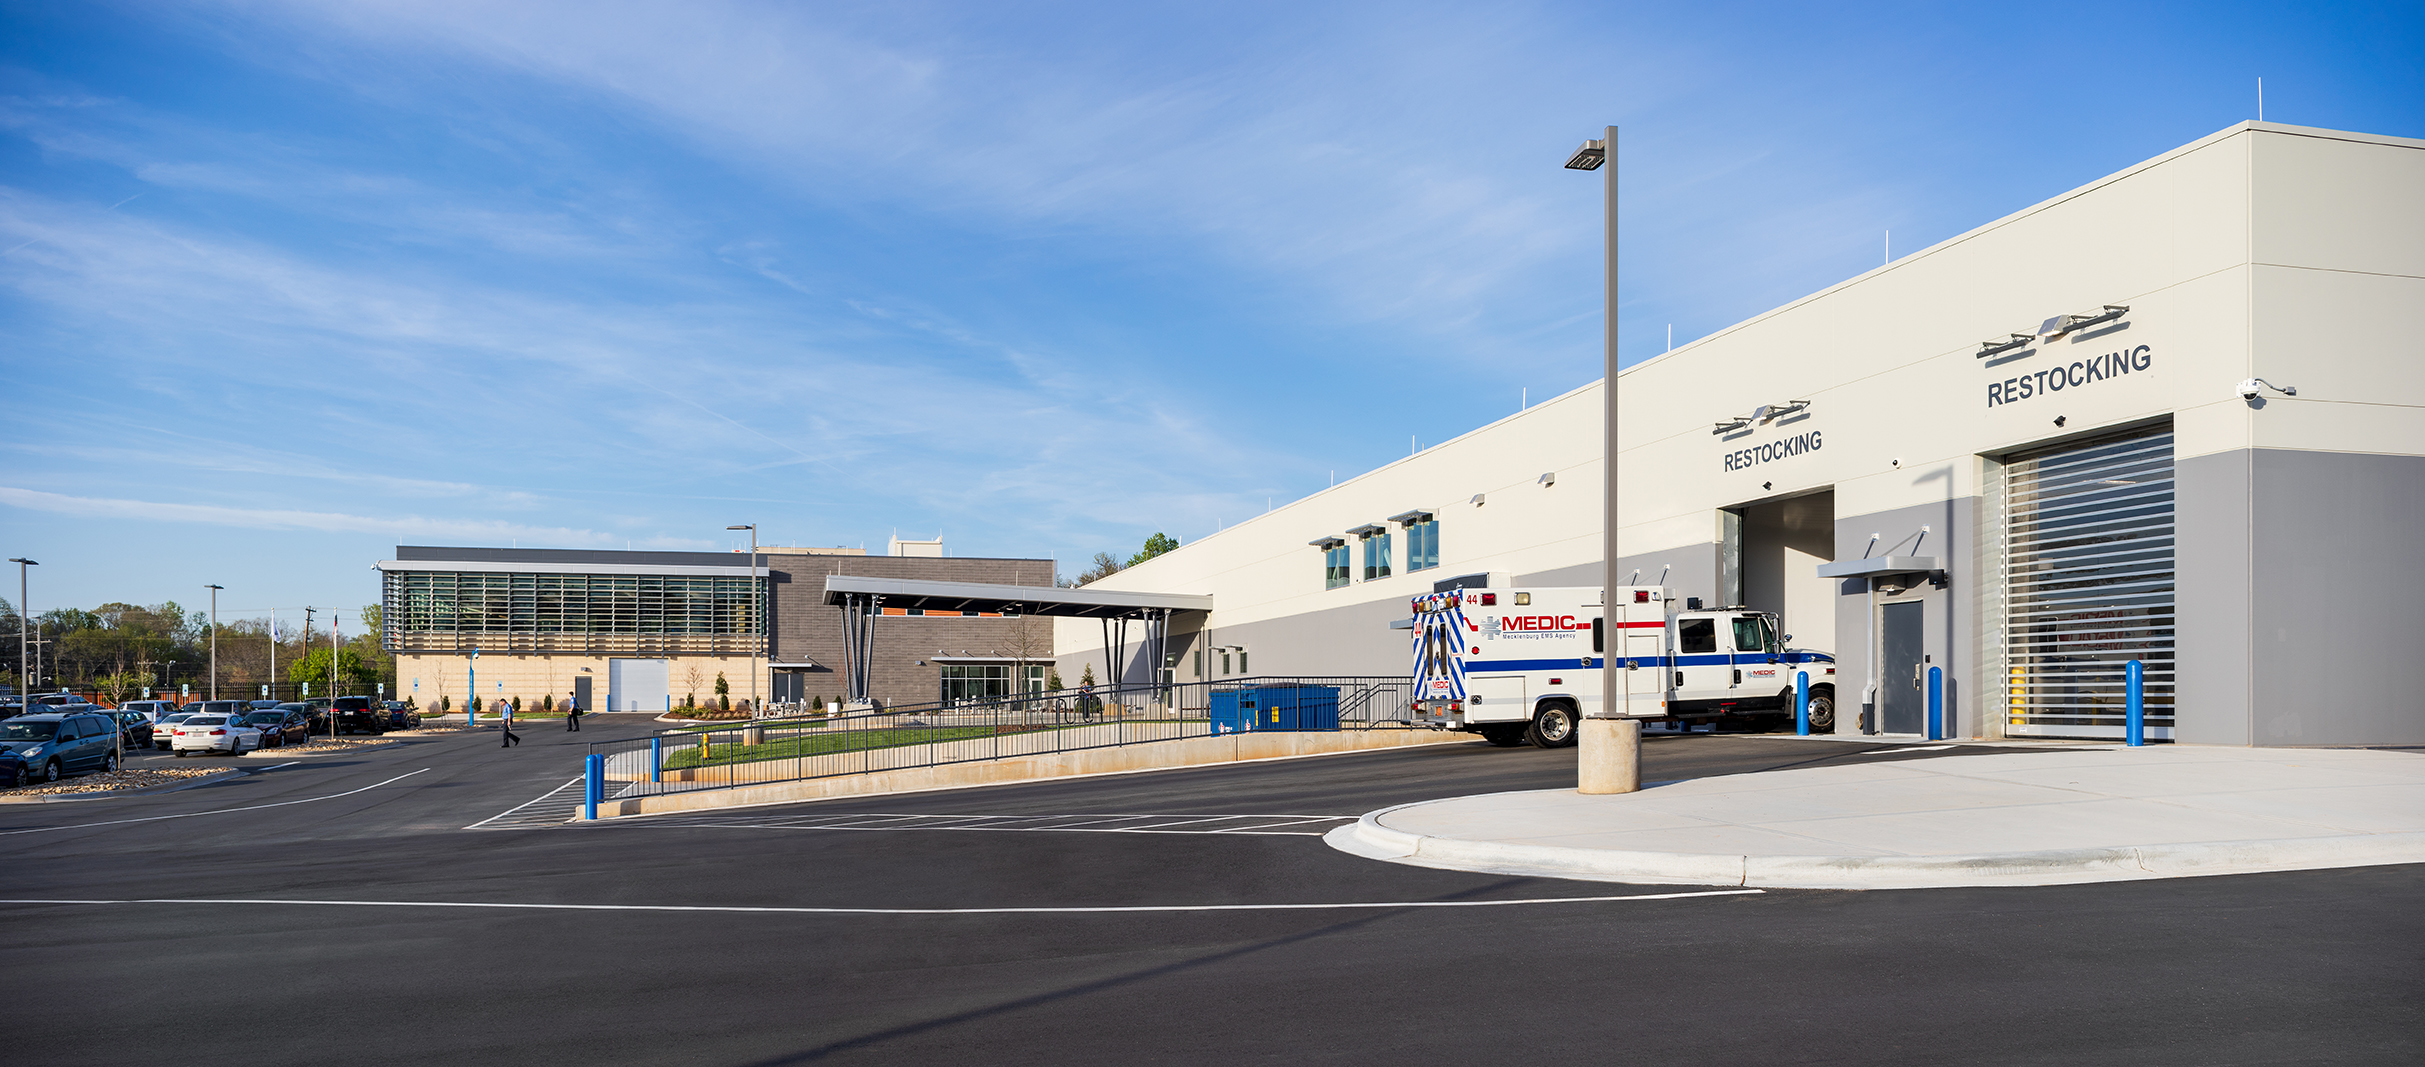 ADW-Public-Safety-MEDIC-Headquarters-Charlotte-NC-Restocking.jpg